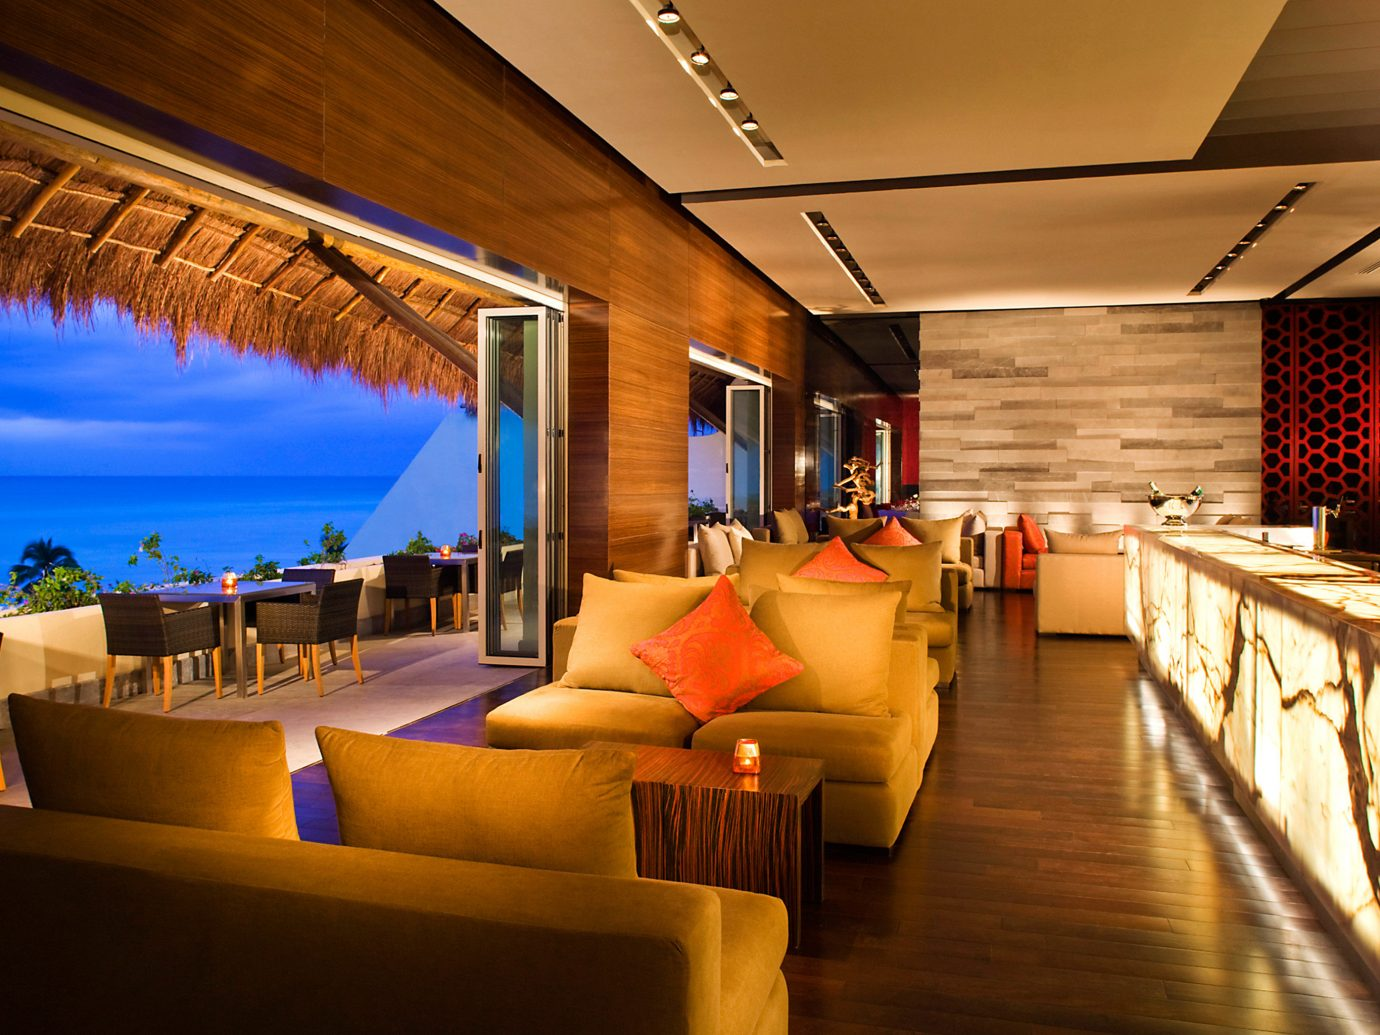 All-Inclusive Resorts Beach Beachfront Elegant Hotels Living Lounge Luxury Modern Scenic views Tropical indoor floor ceiling room estate Resort restaurant interior design function hall furniture